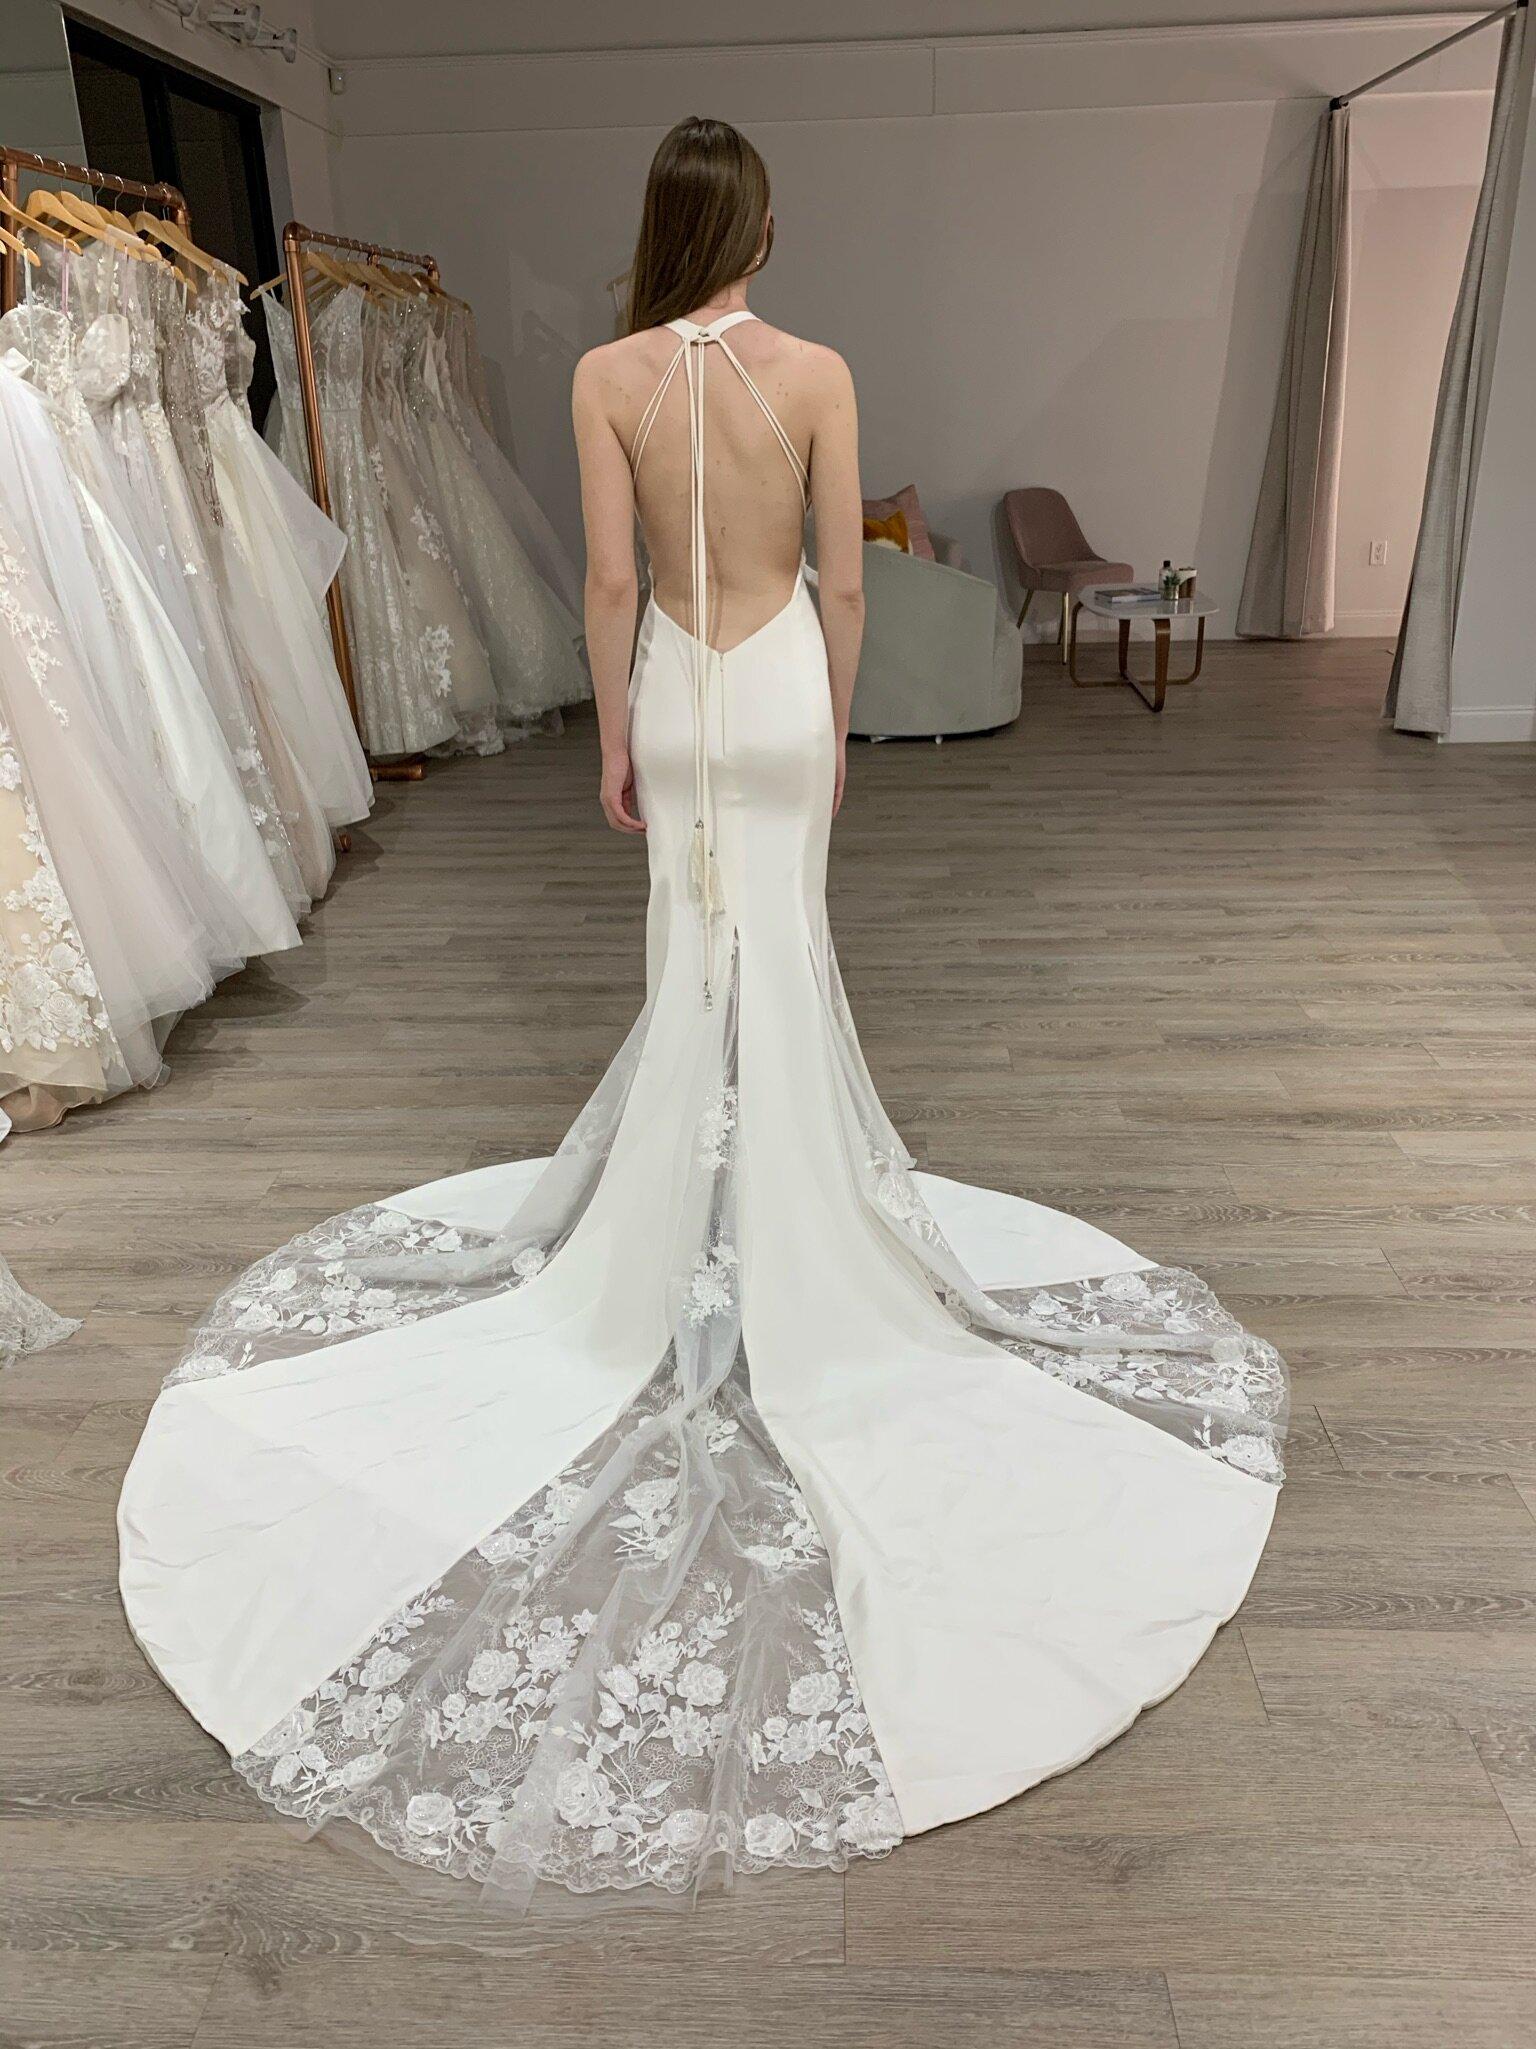 Ines Di Santo Low Back Crepe Wedding Dress in Orlando, FL